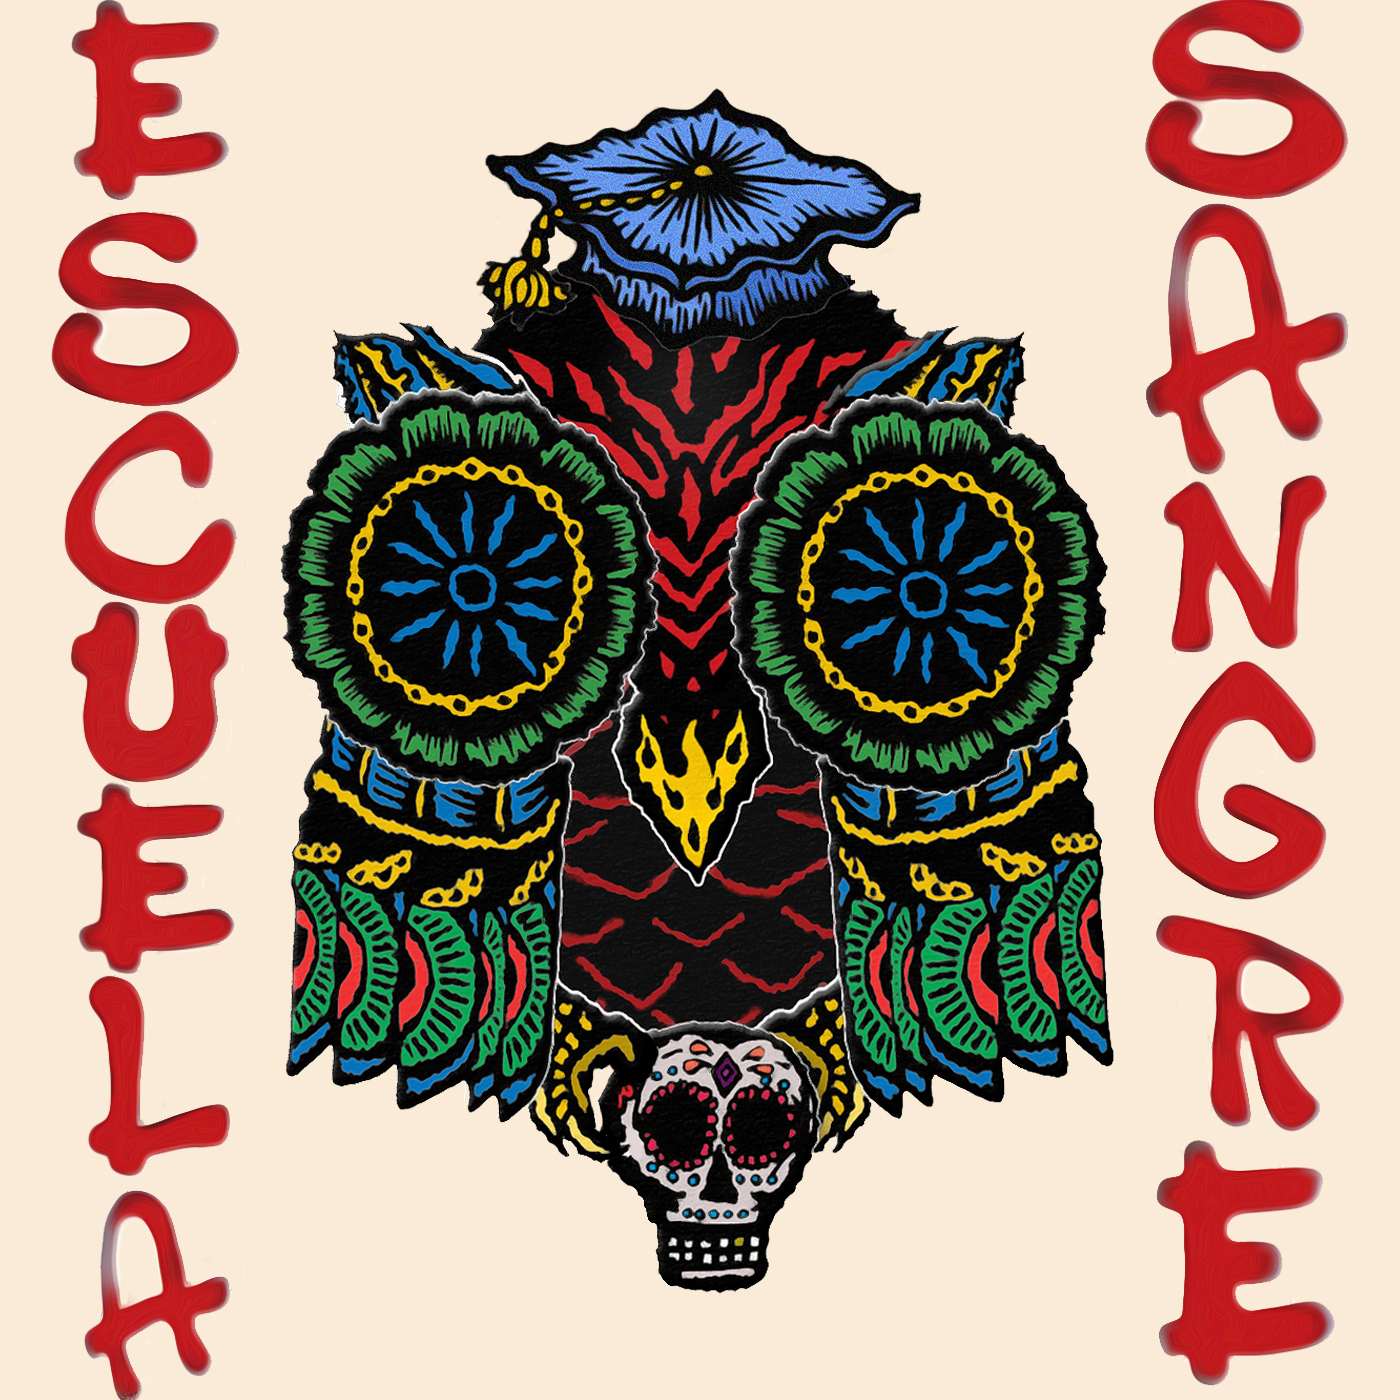 EscuelaSangreLogo (1).jpg